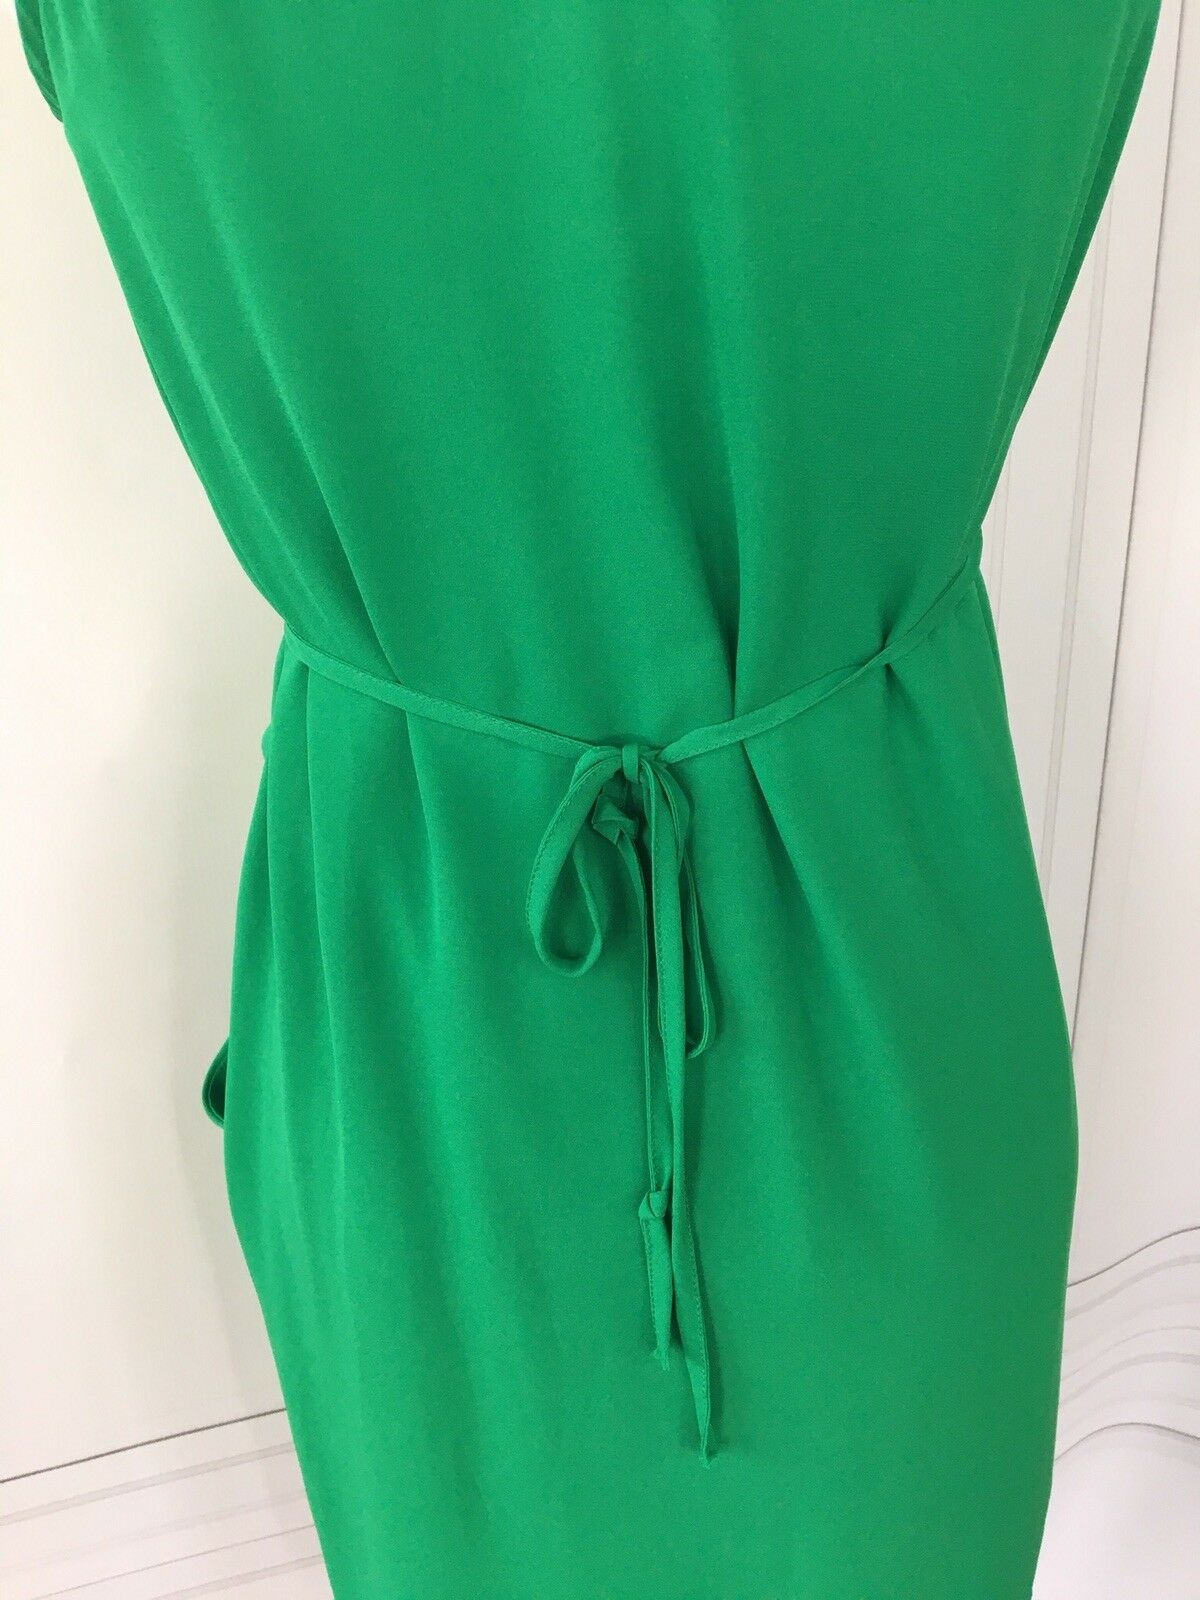 7e7ac64702c78 ... Cusp Cusp Cusp for Neiman Marcus Kelly Green Silk Dress Sz S c0647f